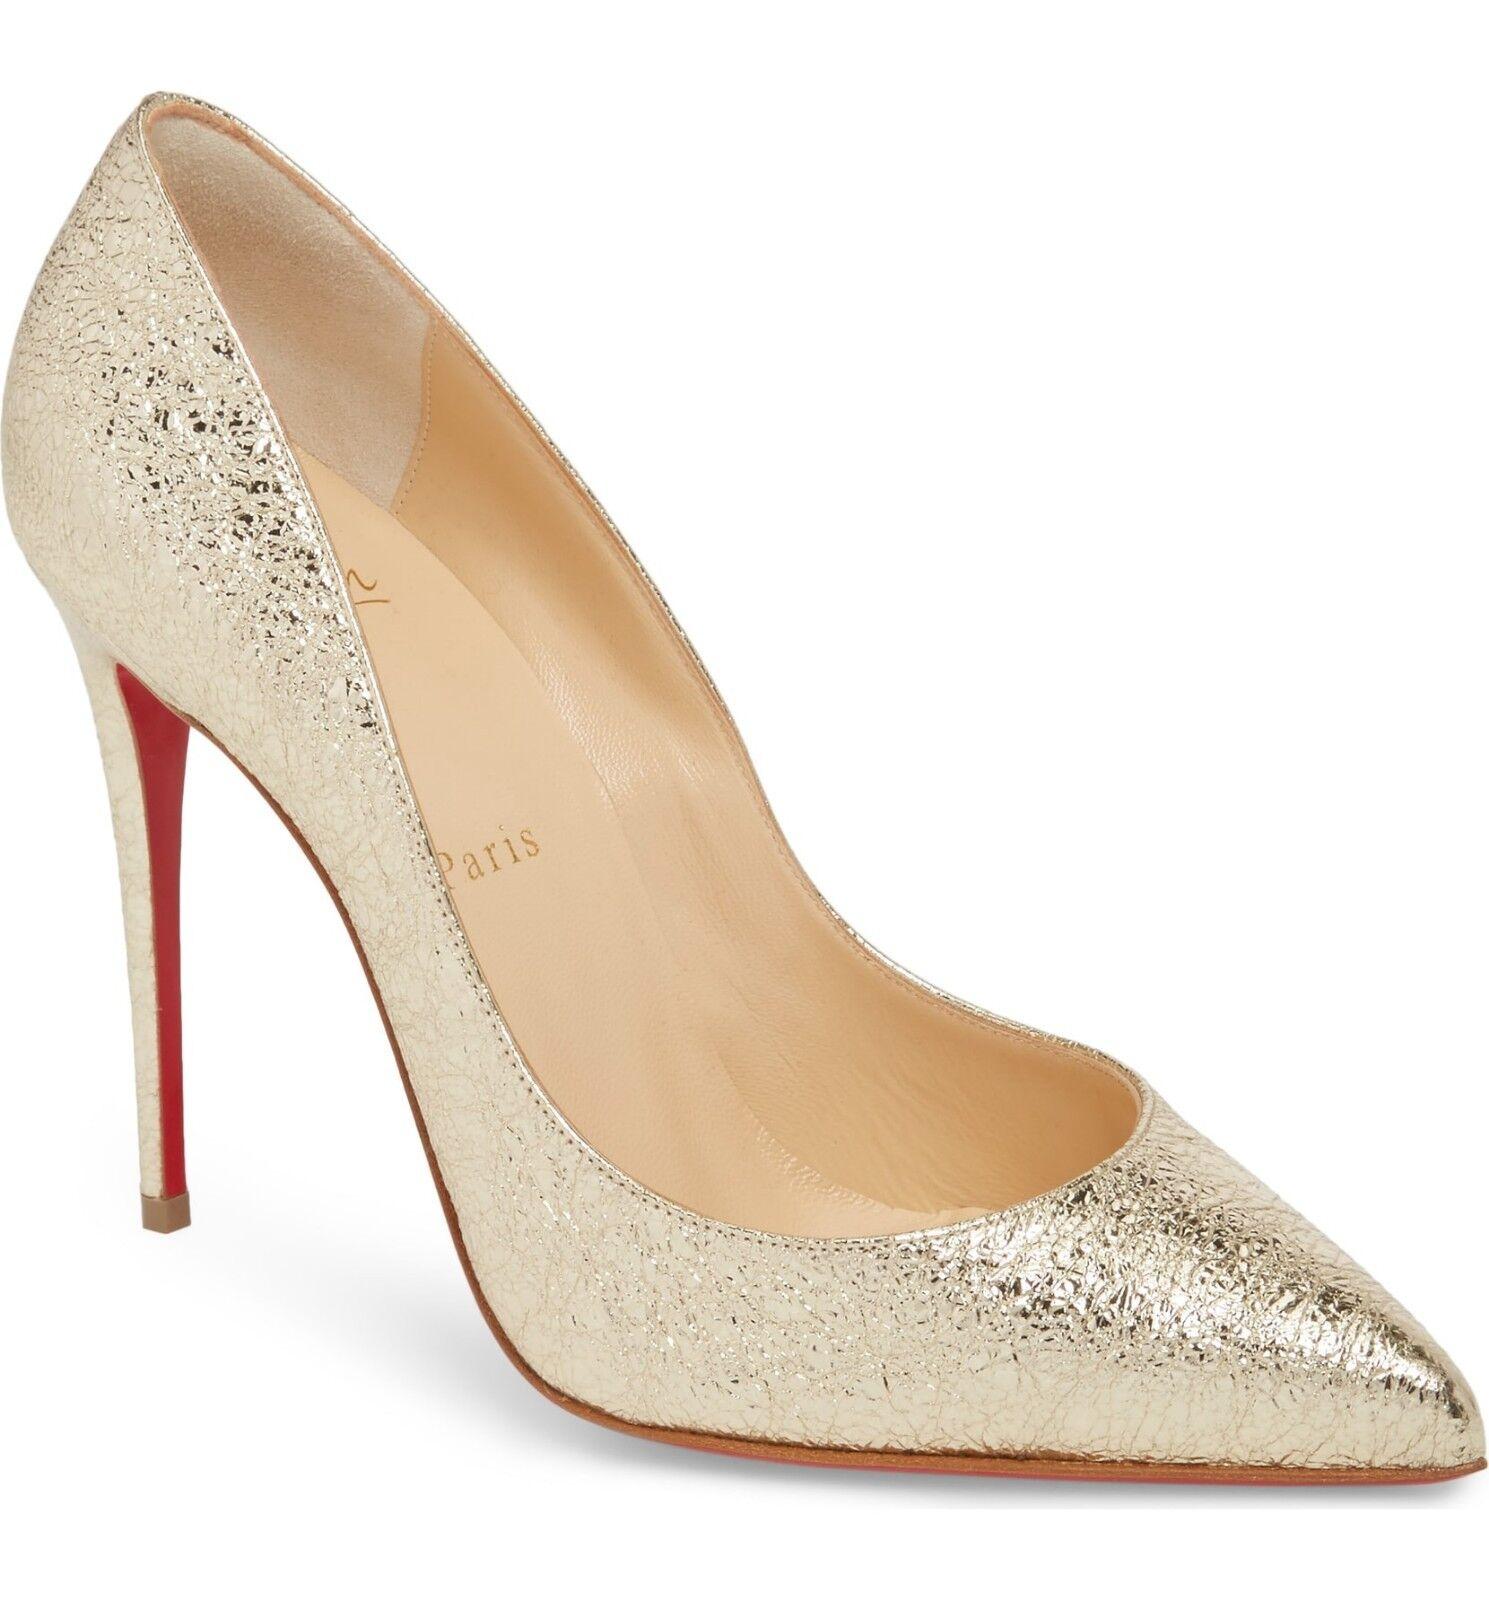 NIB Christian Louboutin  PIGALLE FOLLES PLAIINE oro Leather Pump scarpe 38 -7.5  nuovo sadico